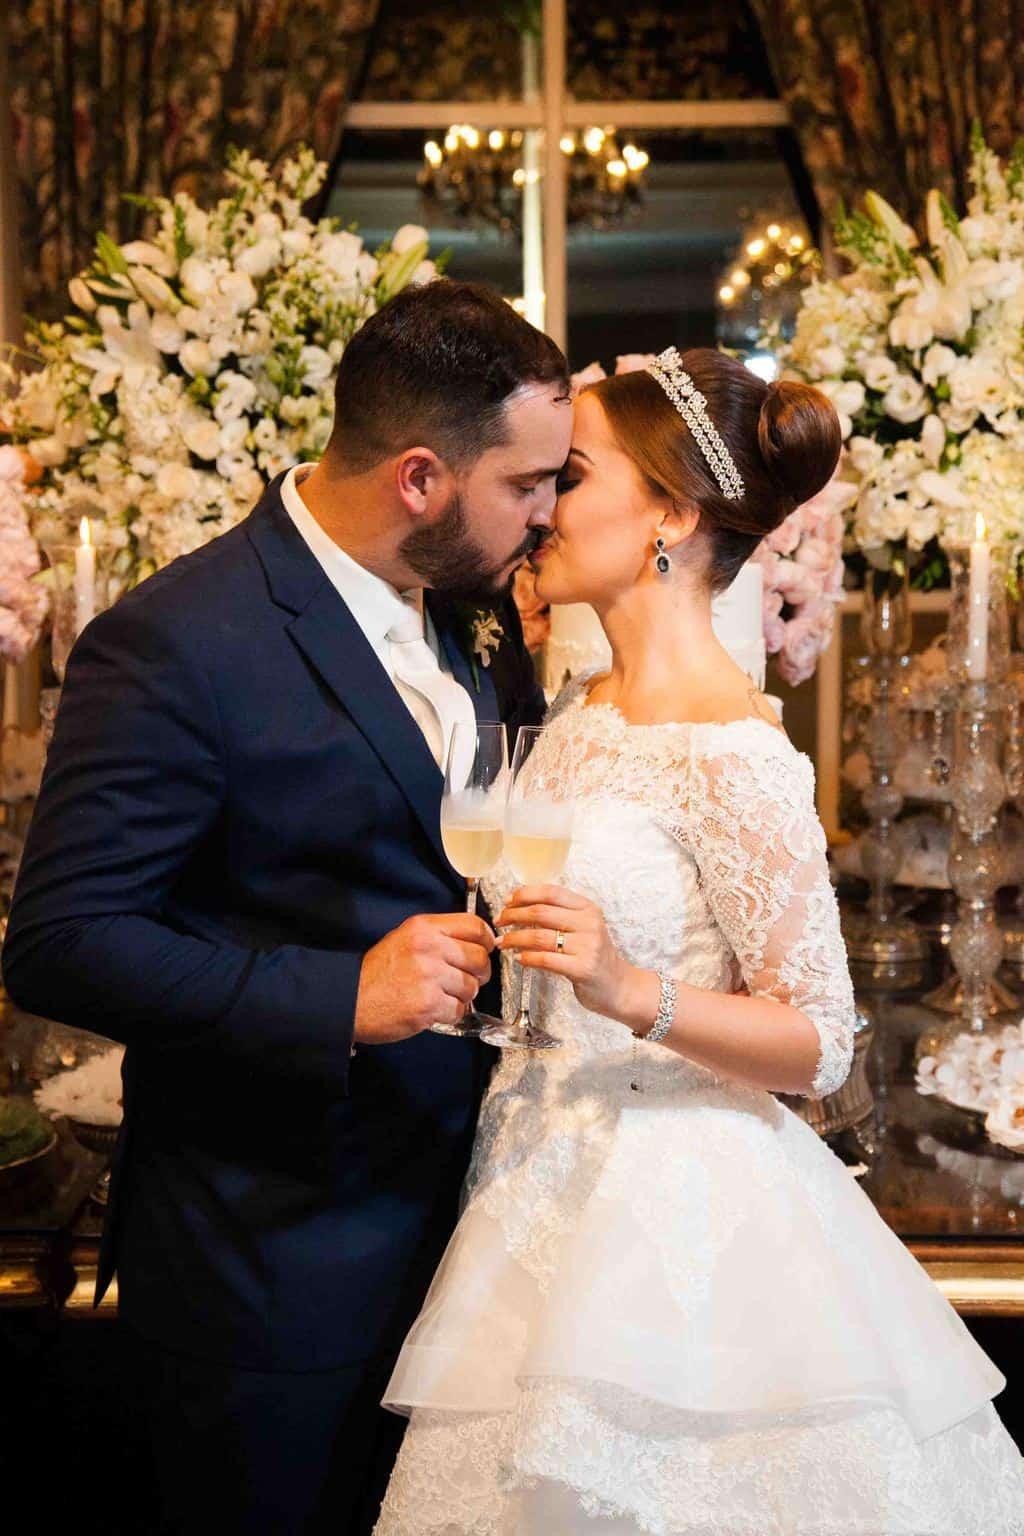 Casamento-Clássico-Casamento-tradicional-Copacabana-Palace-Monica-Roias-Poses-Casal-Ribas-Foto-e-Vídeo-Tuanny-e-Bernardo-CaseMe-6